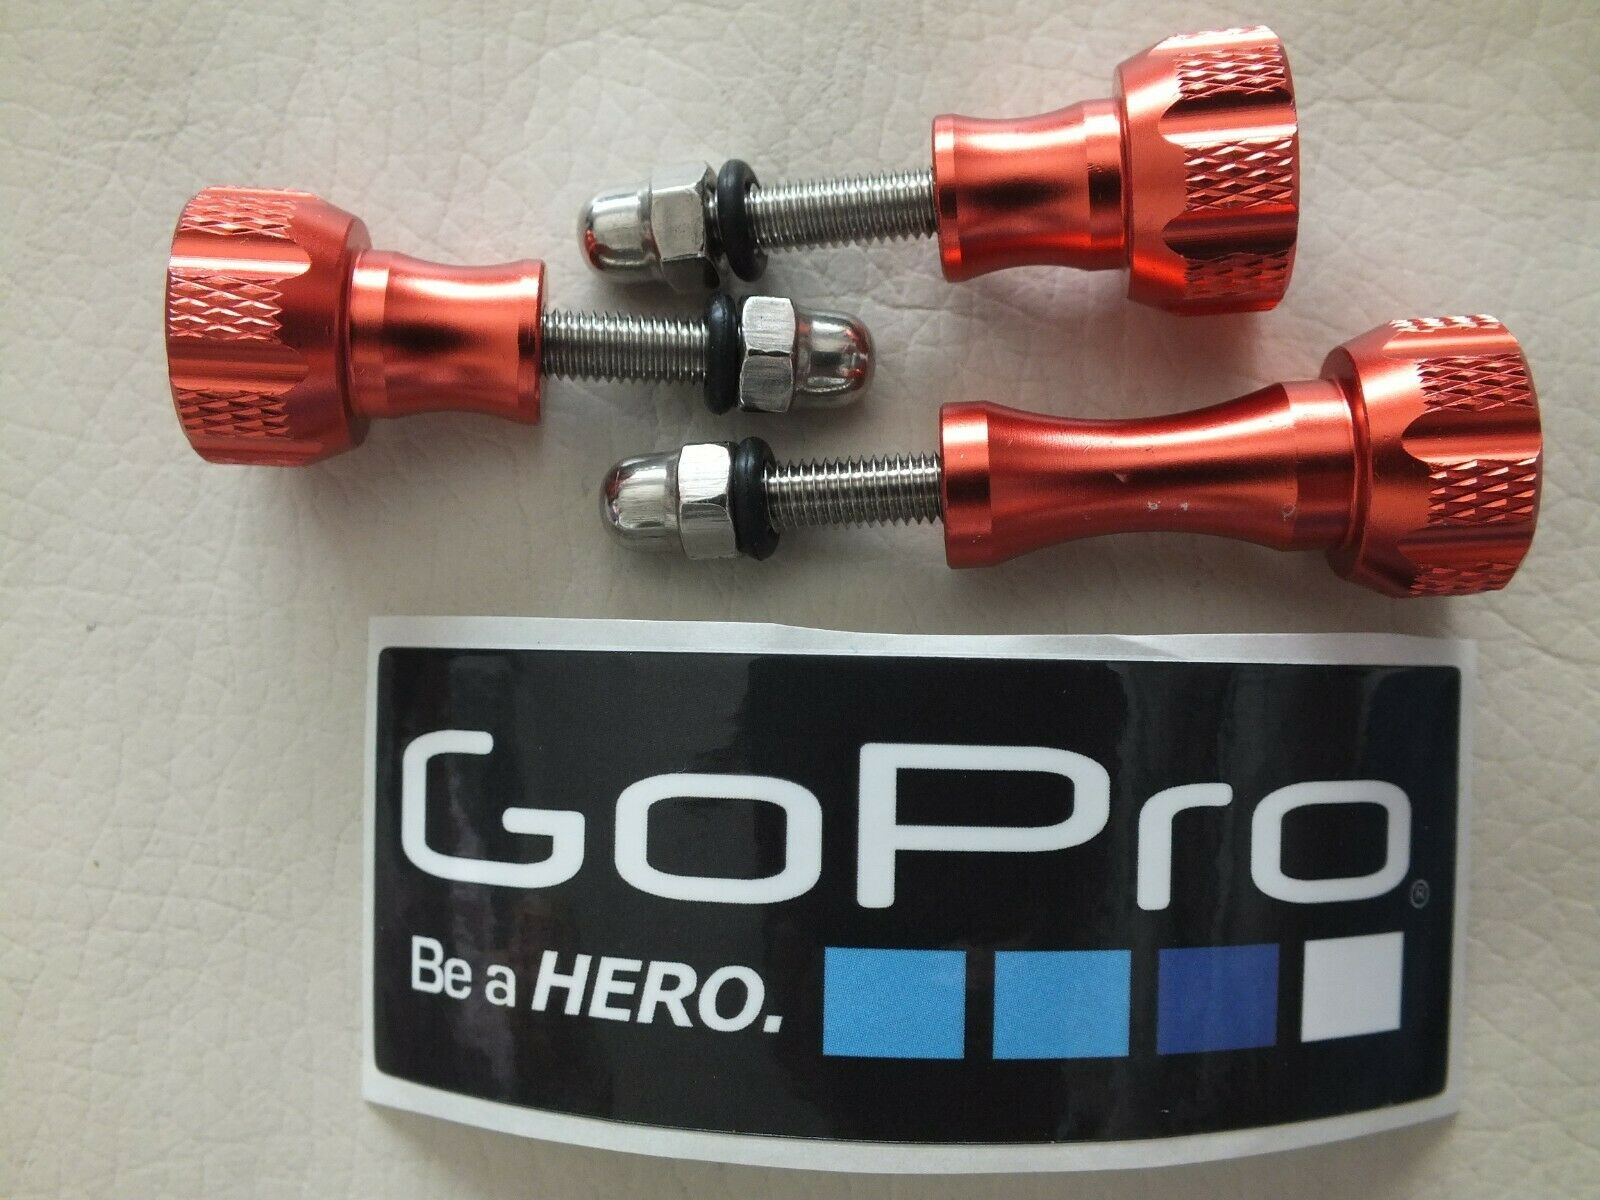 3 Aluminium alloy Knob Thumb Screw Mount for Gopro hero 3 4 5 6 7 & 8 + Sticker